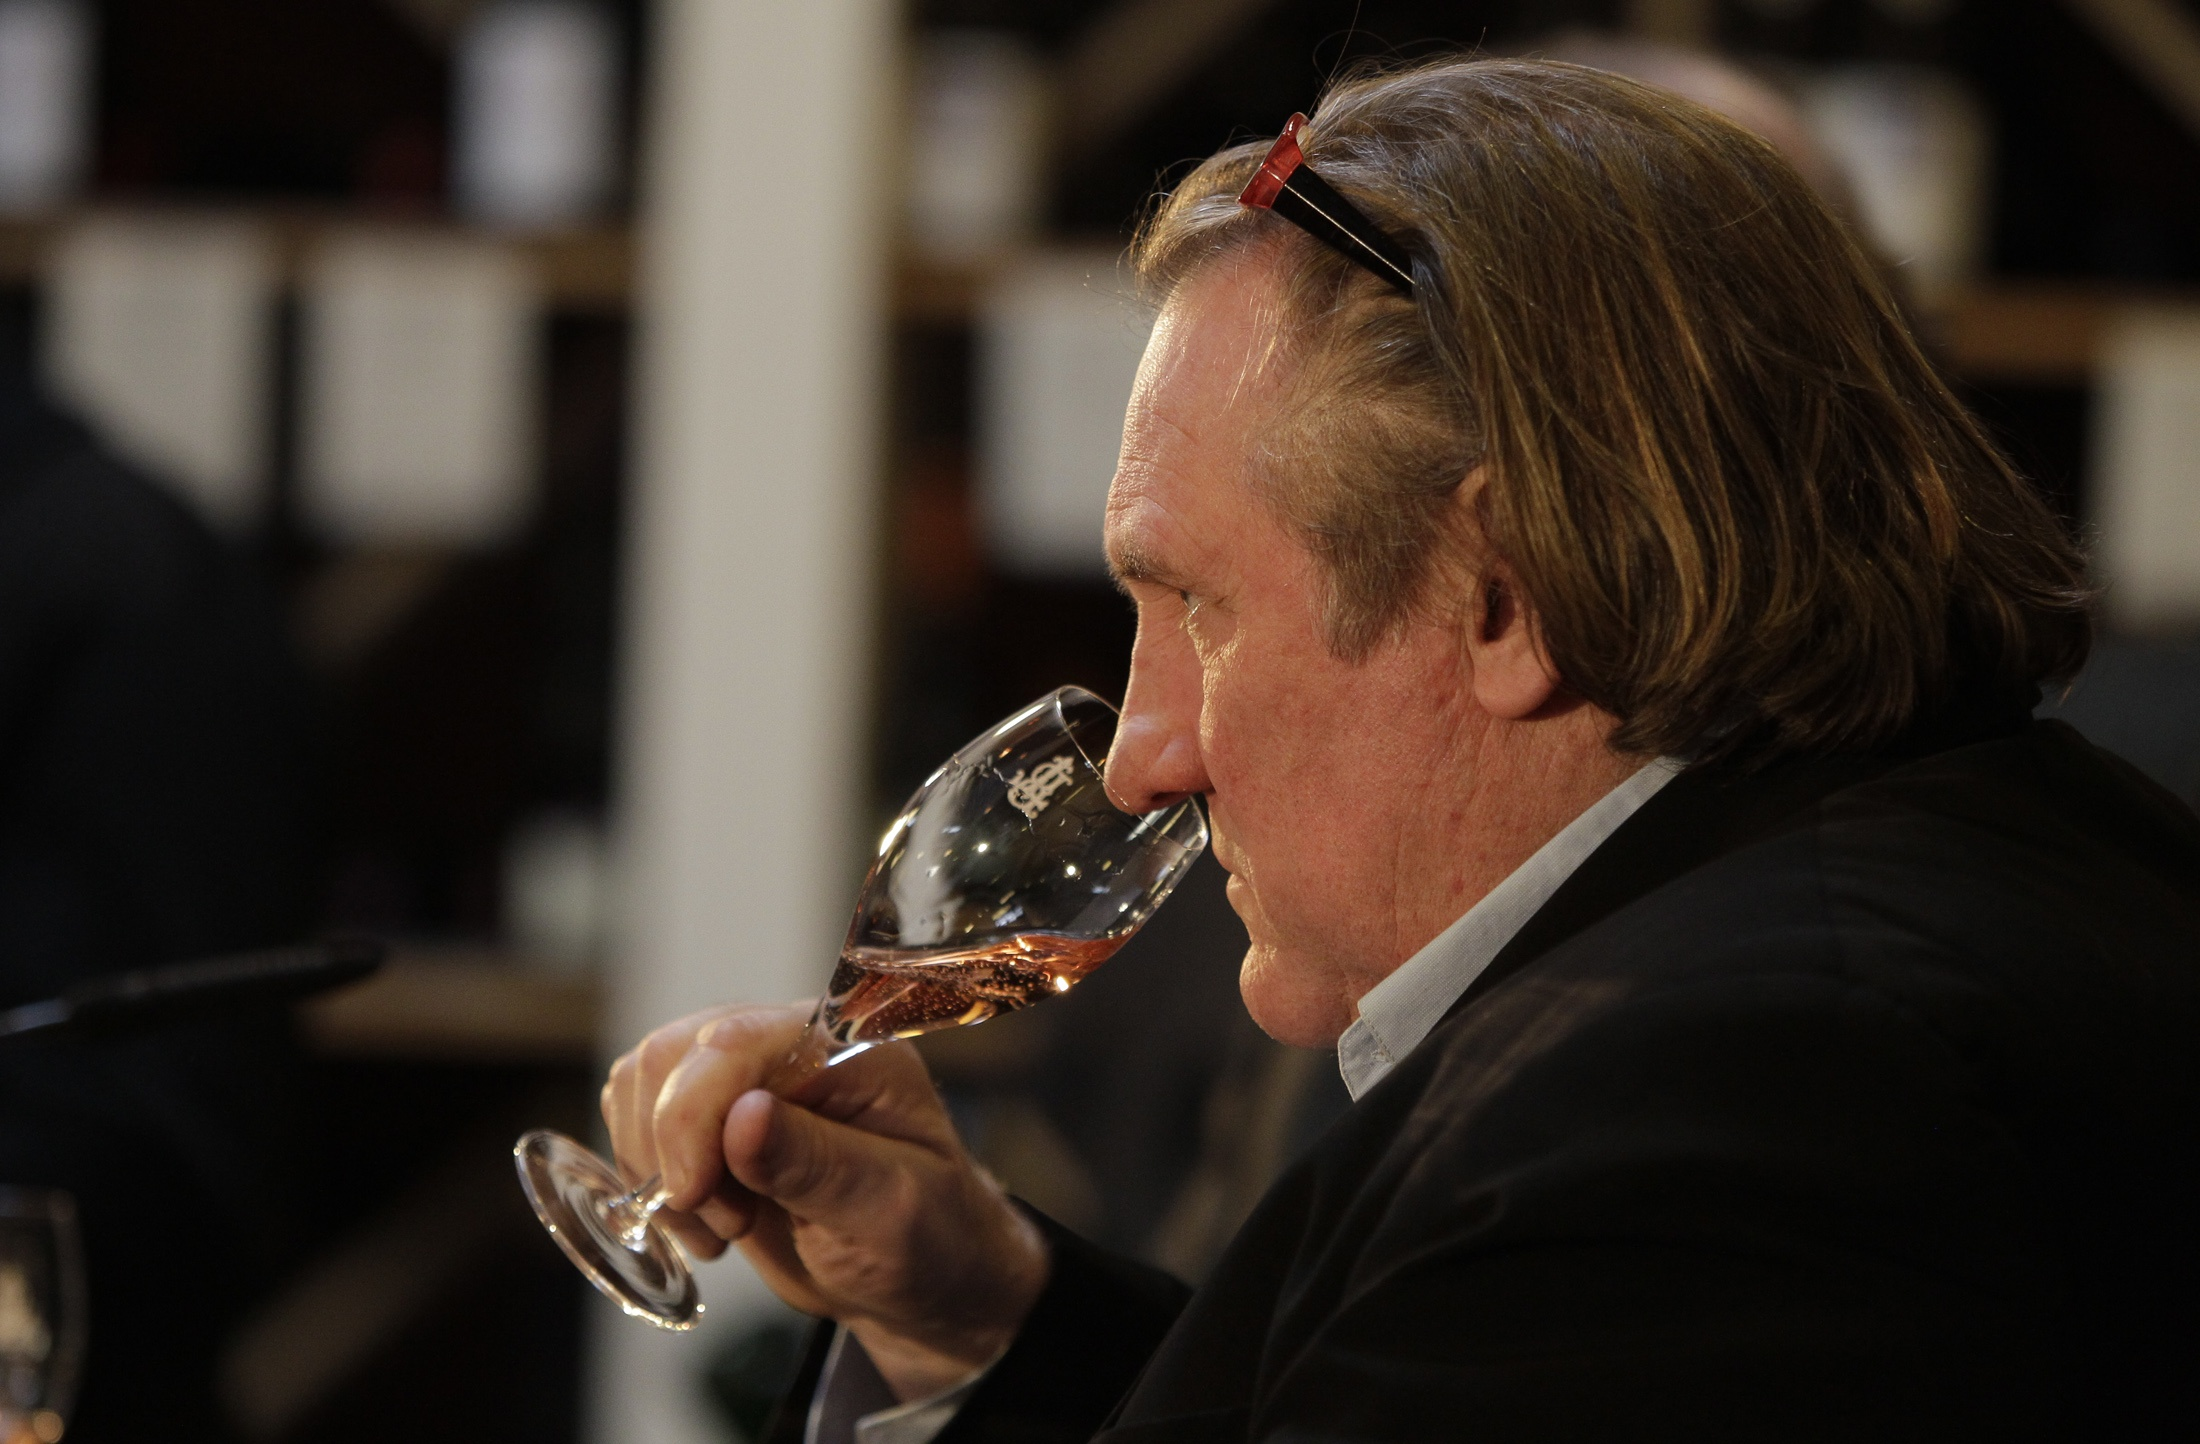 gerard depardieu, Жерар Депардийо